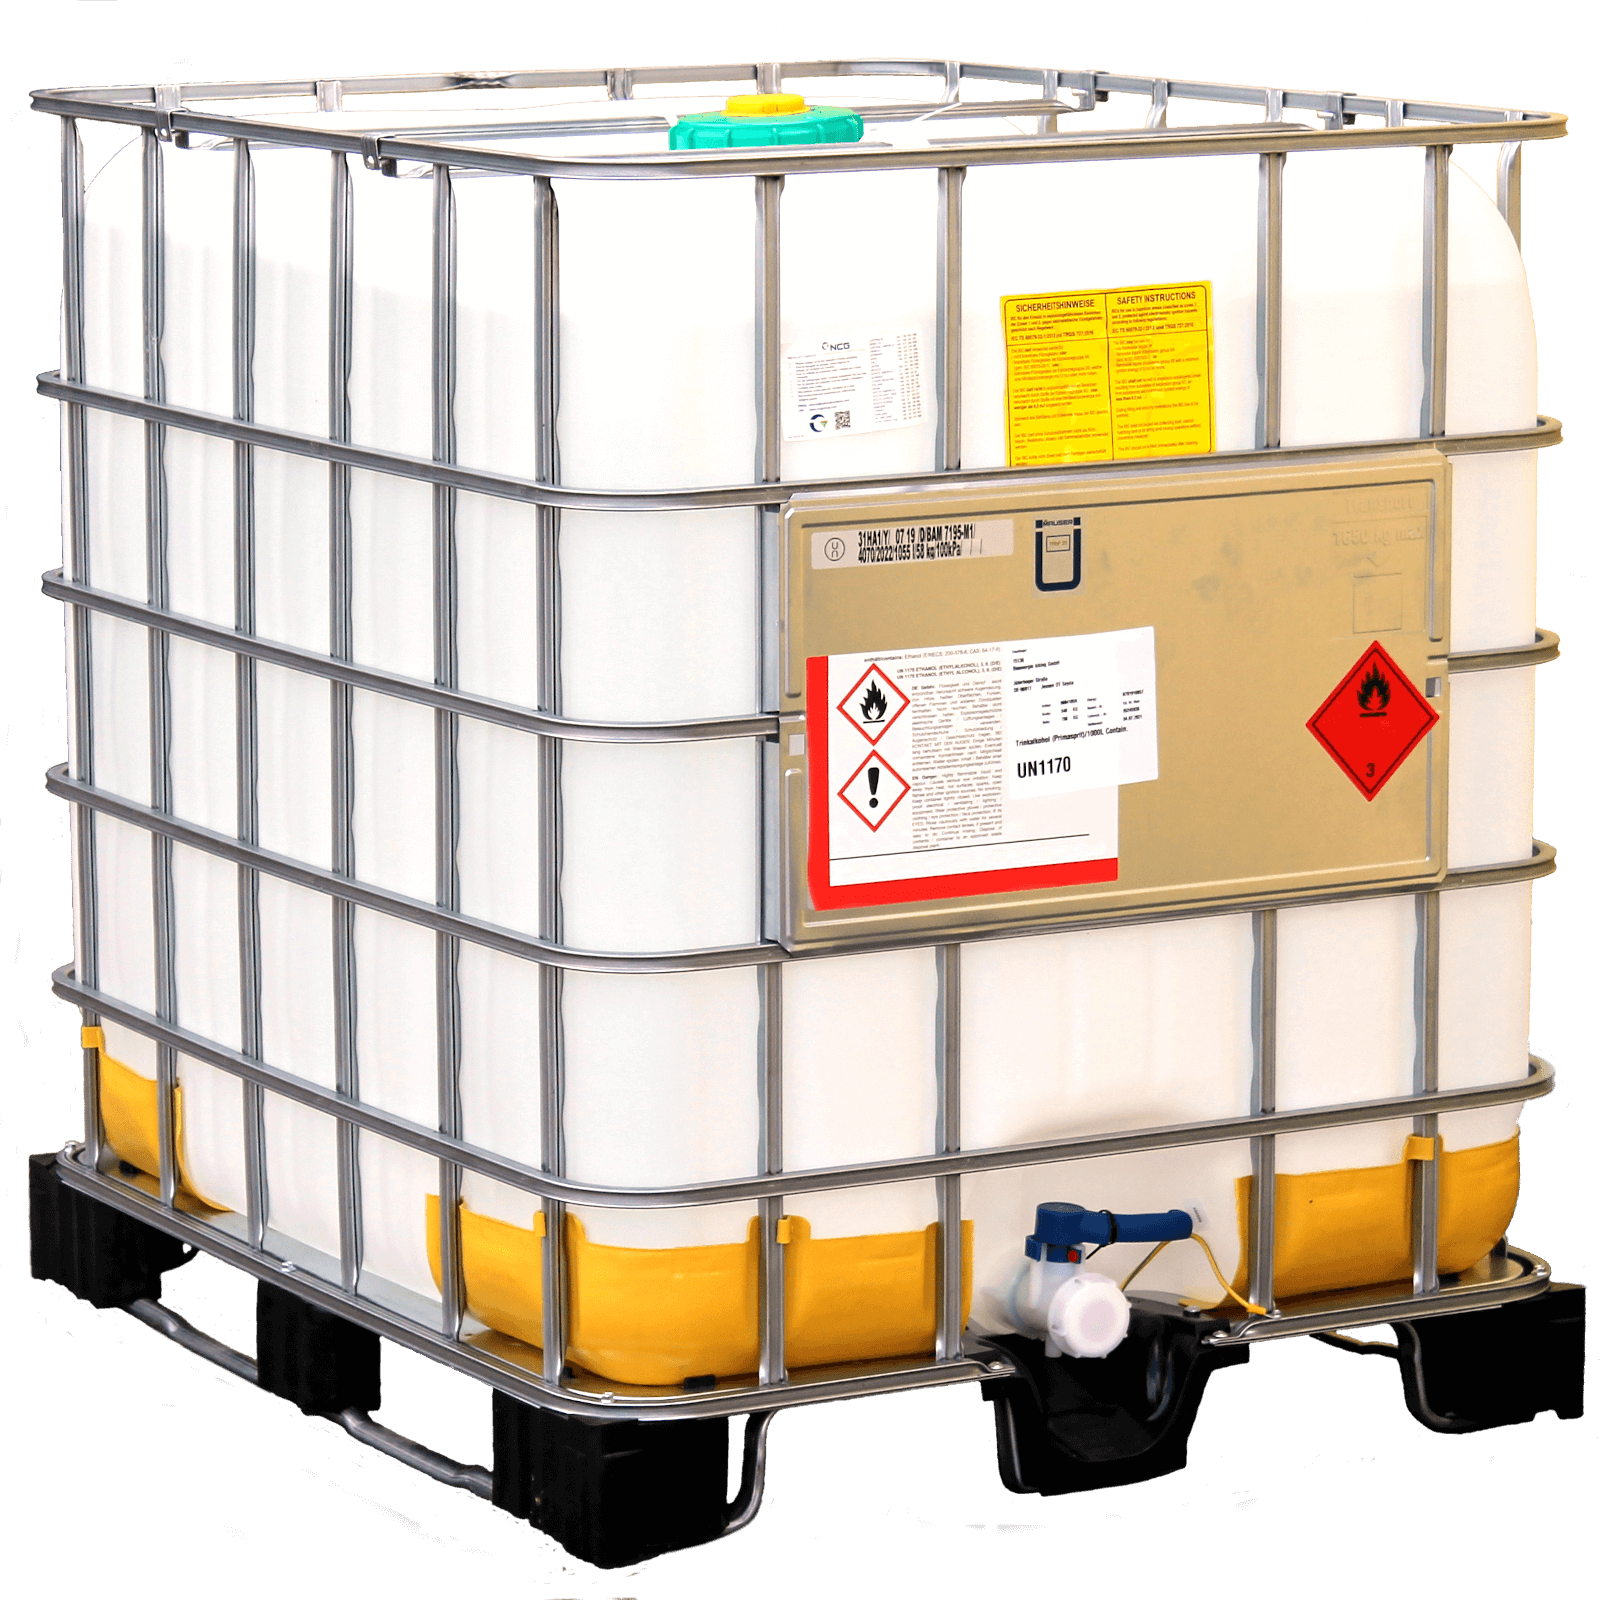 1000 Liter Bioethanol 96,6%, MEK 1%, IPA 1%, Bitrex 1g, 1 Container